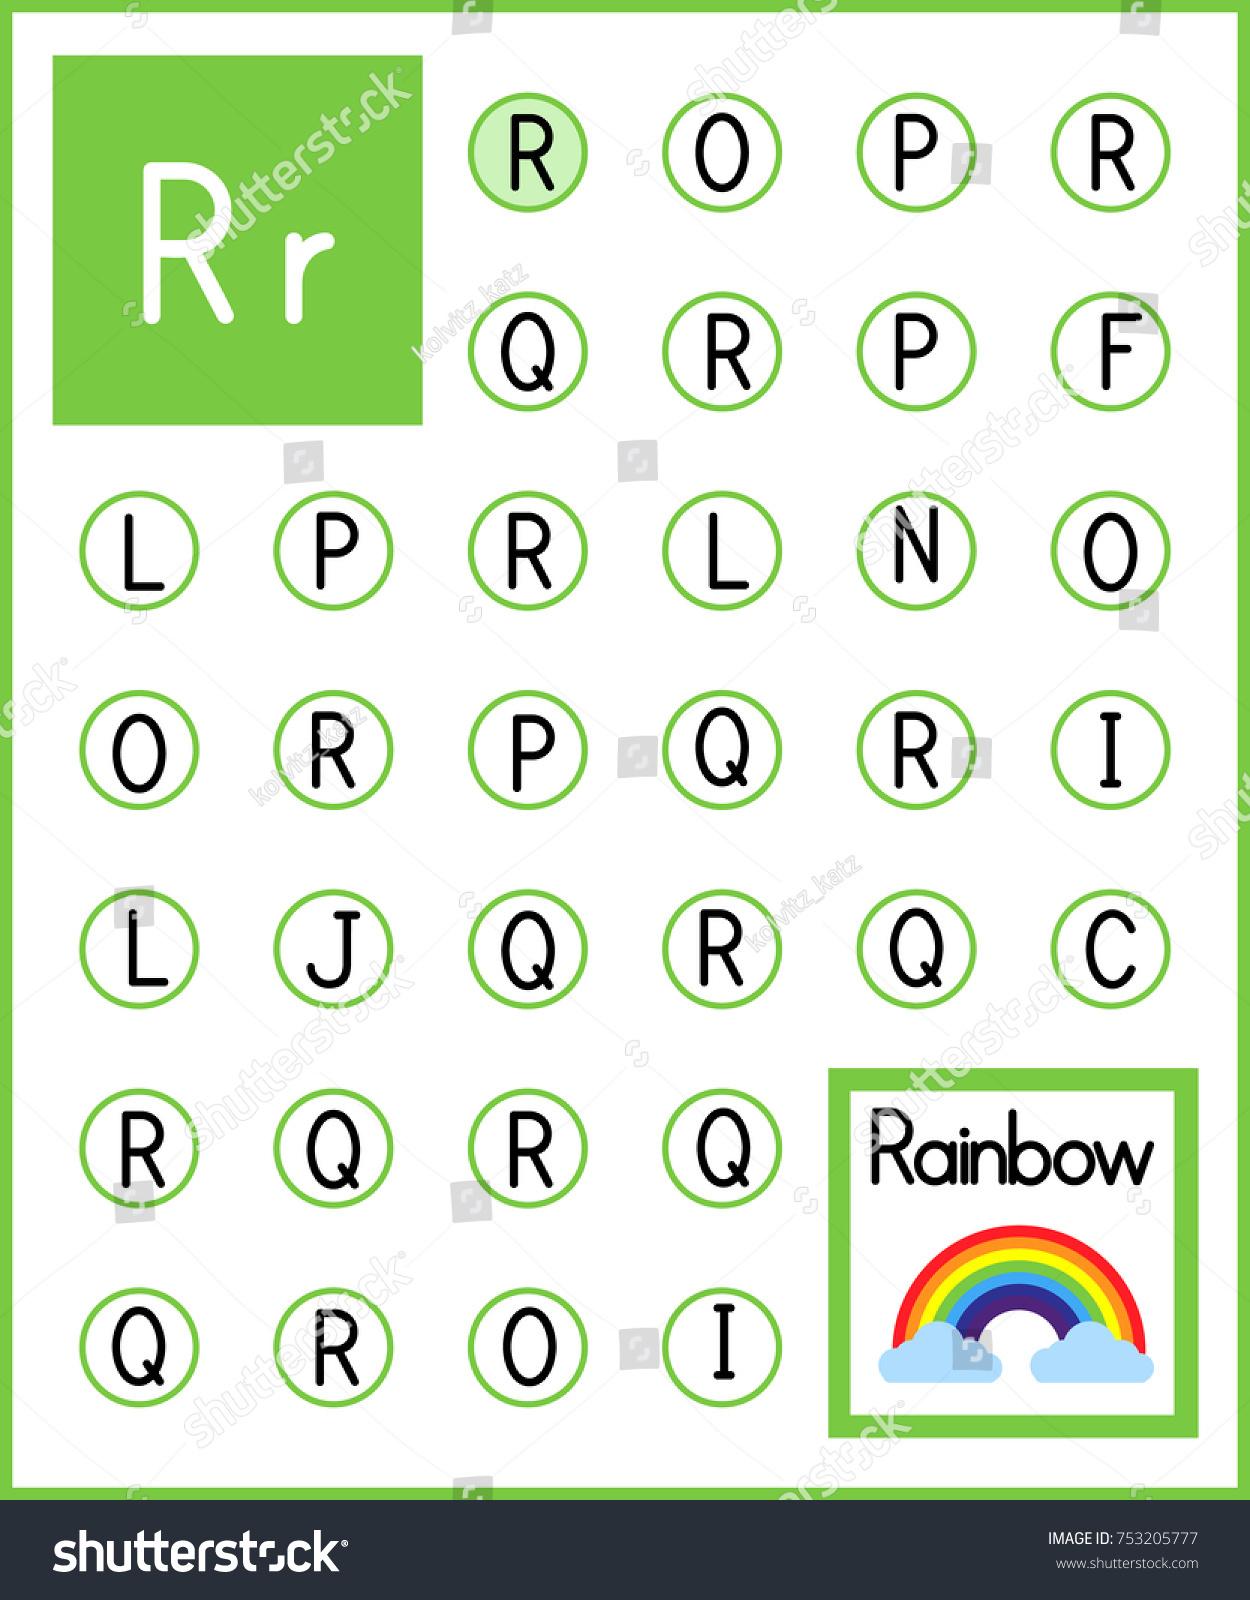 Letter R Worksheet